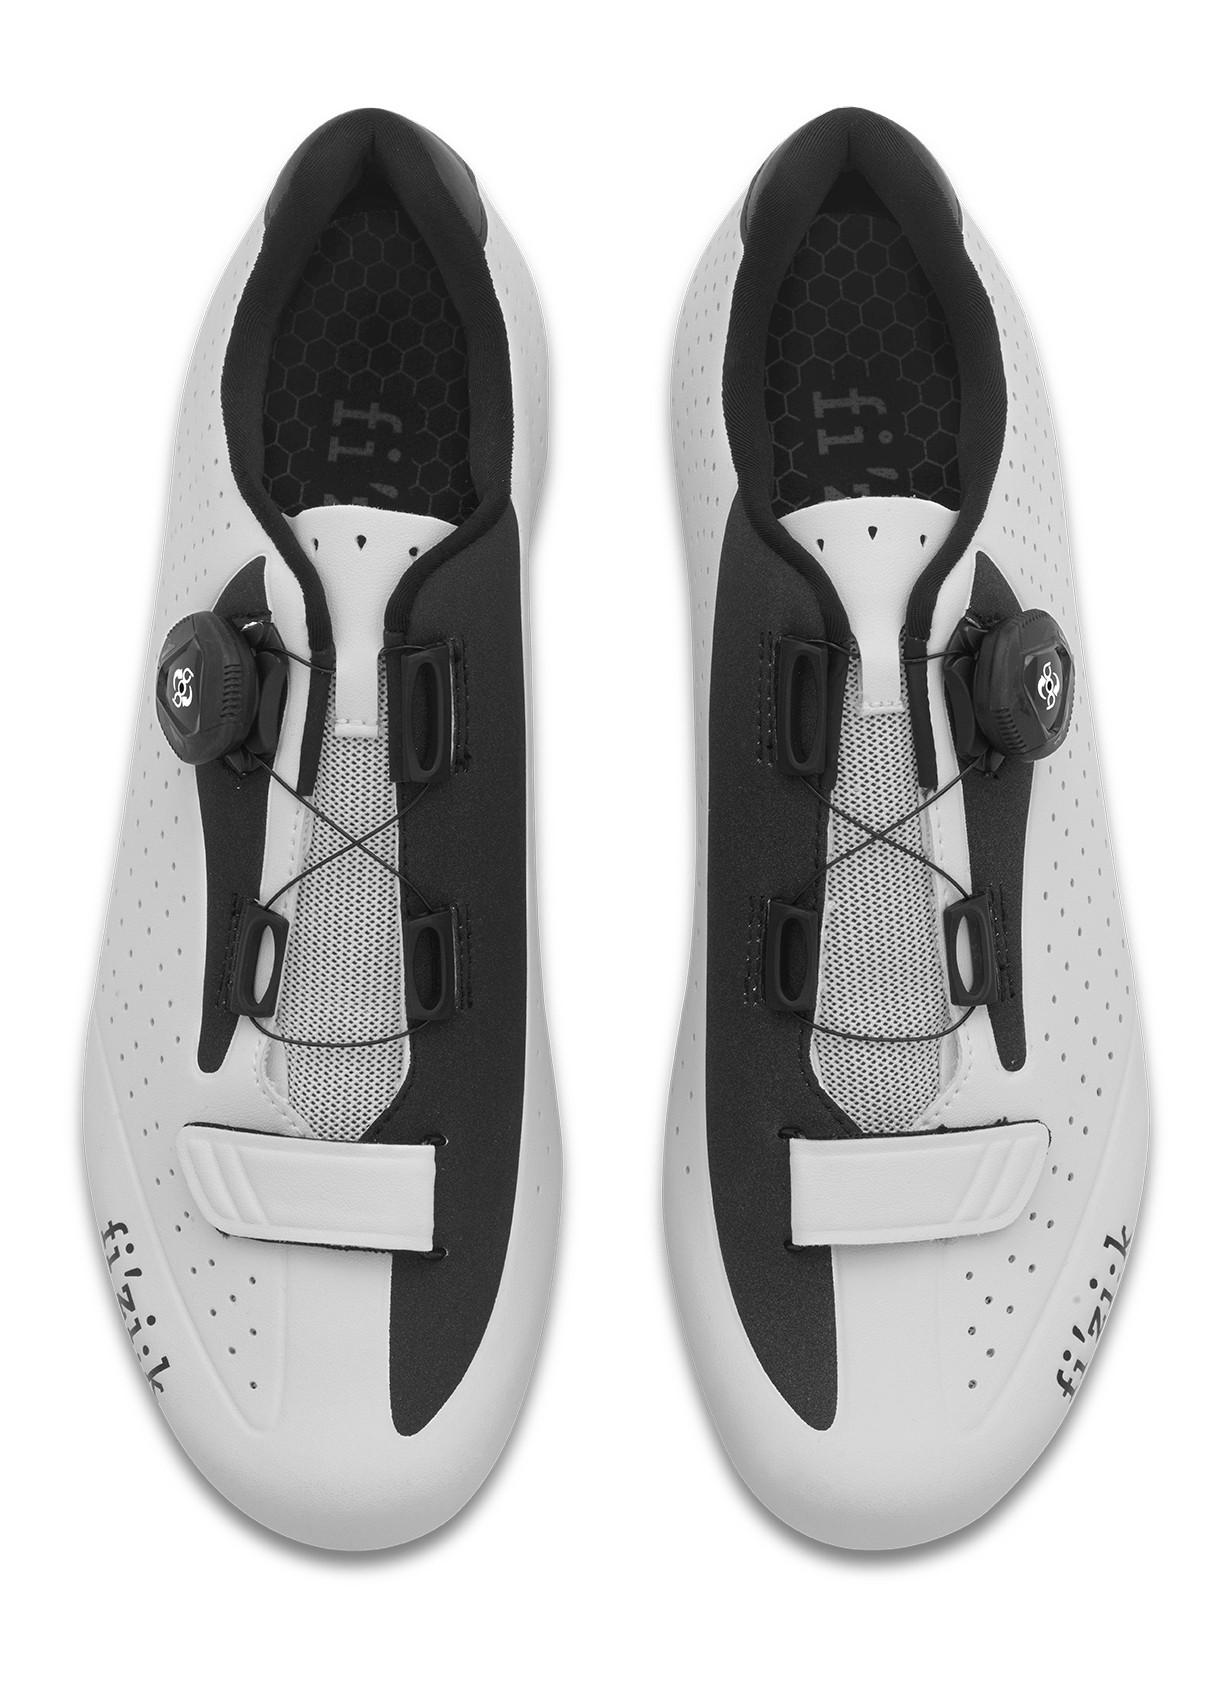 Fizik R5 boa Rennradschuhe weiß schwarz